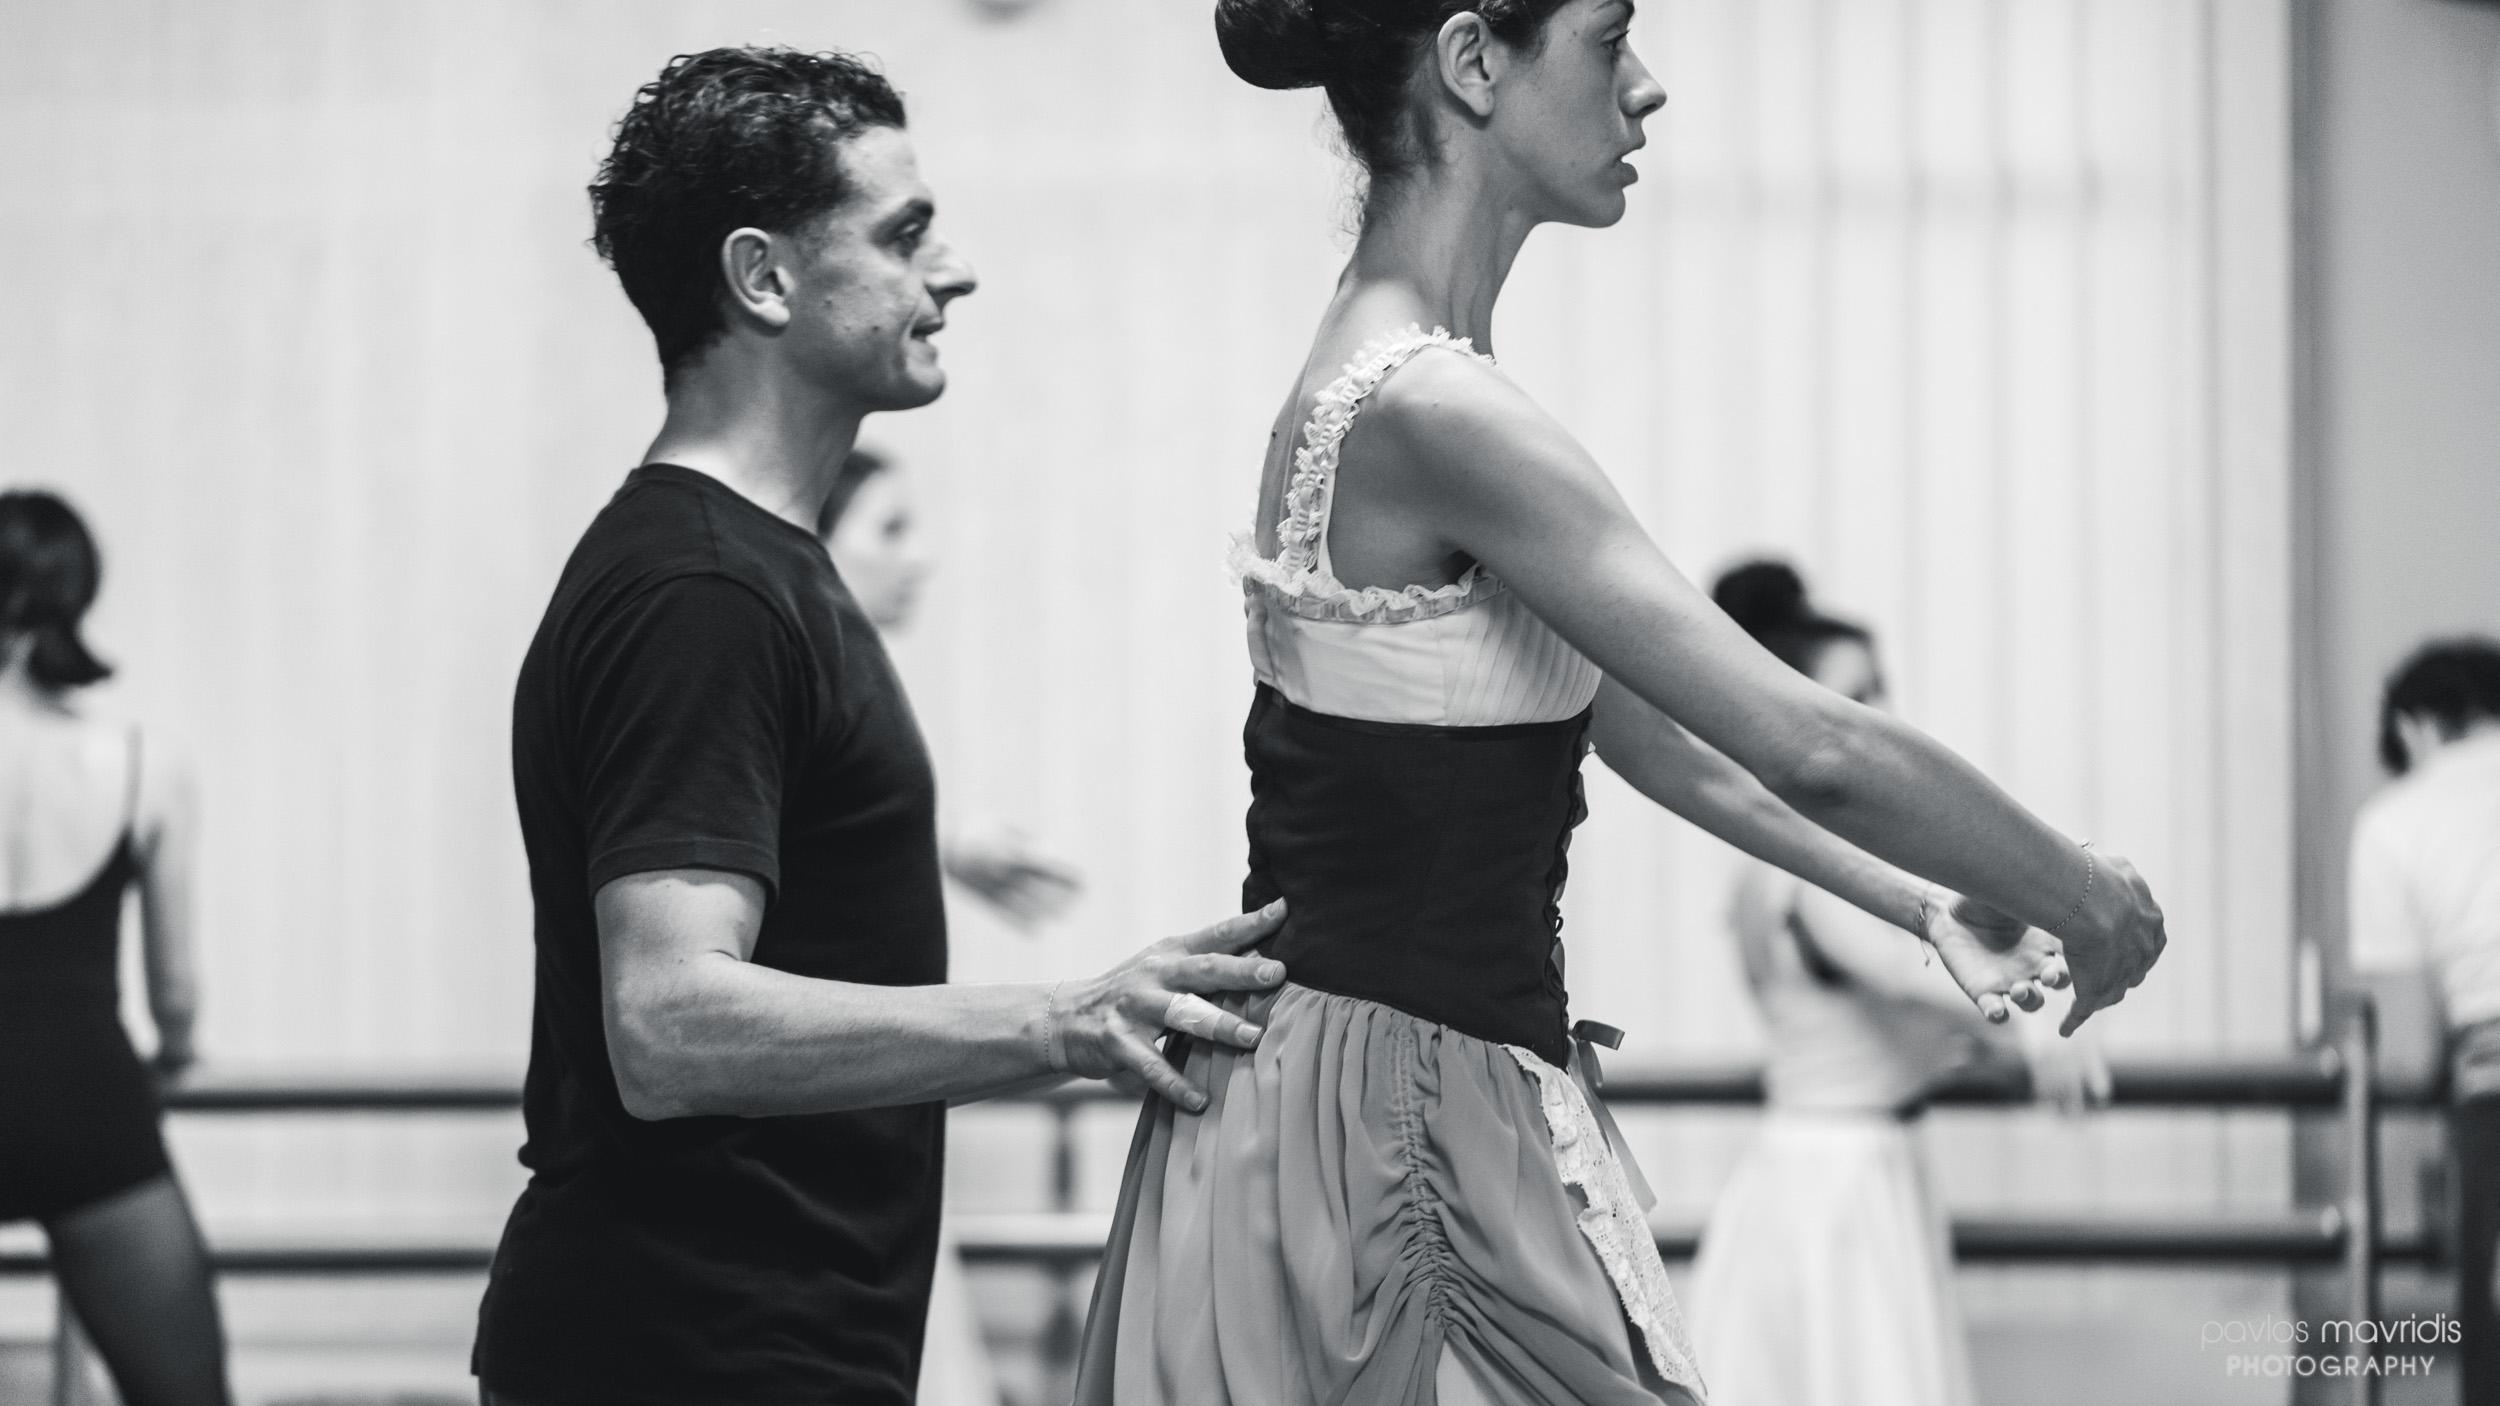 La Fille Mal Gardée - Just One Breath_Rehearsal_02_hires_web.jpg